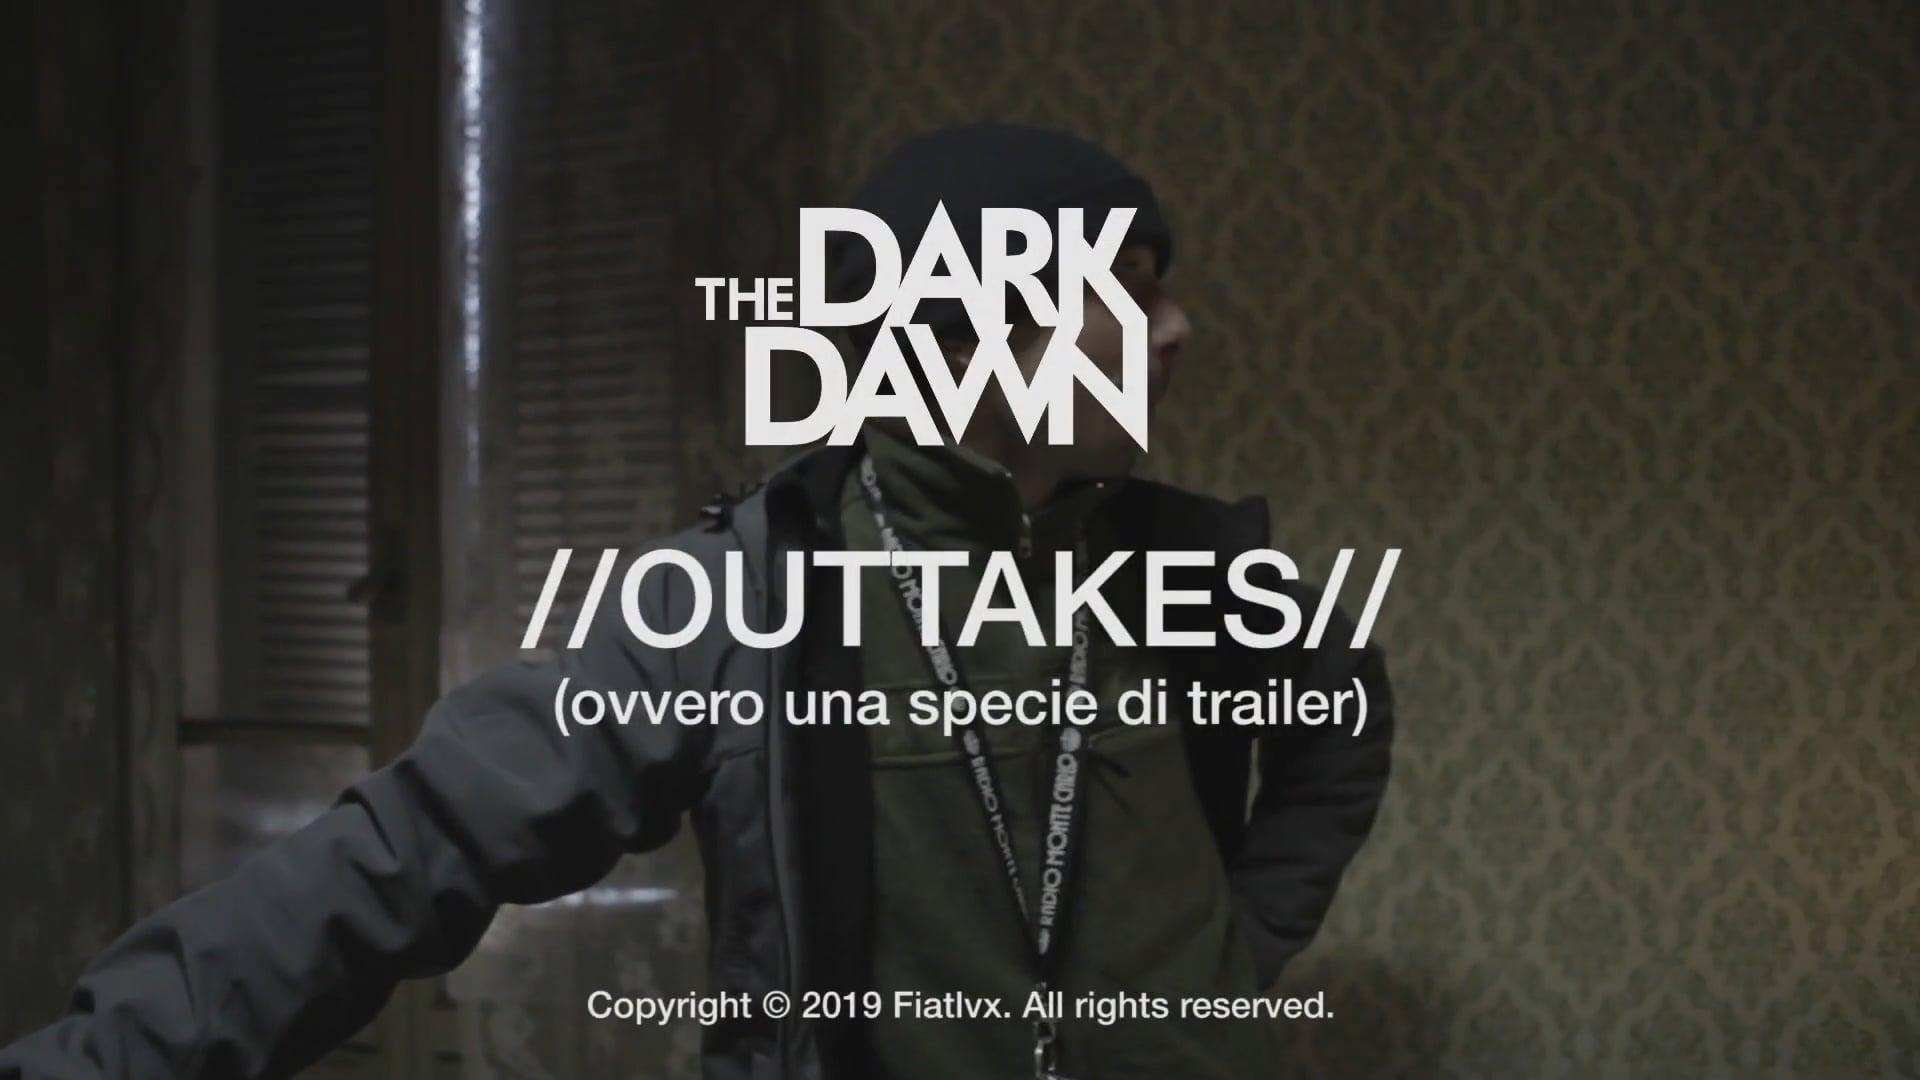 The Dark Dawn OUTTAKES Trailer